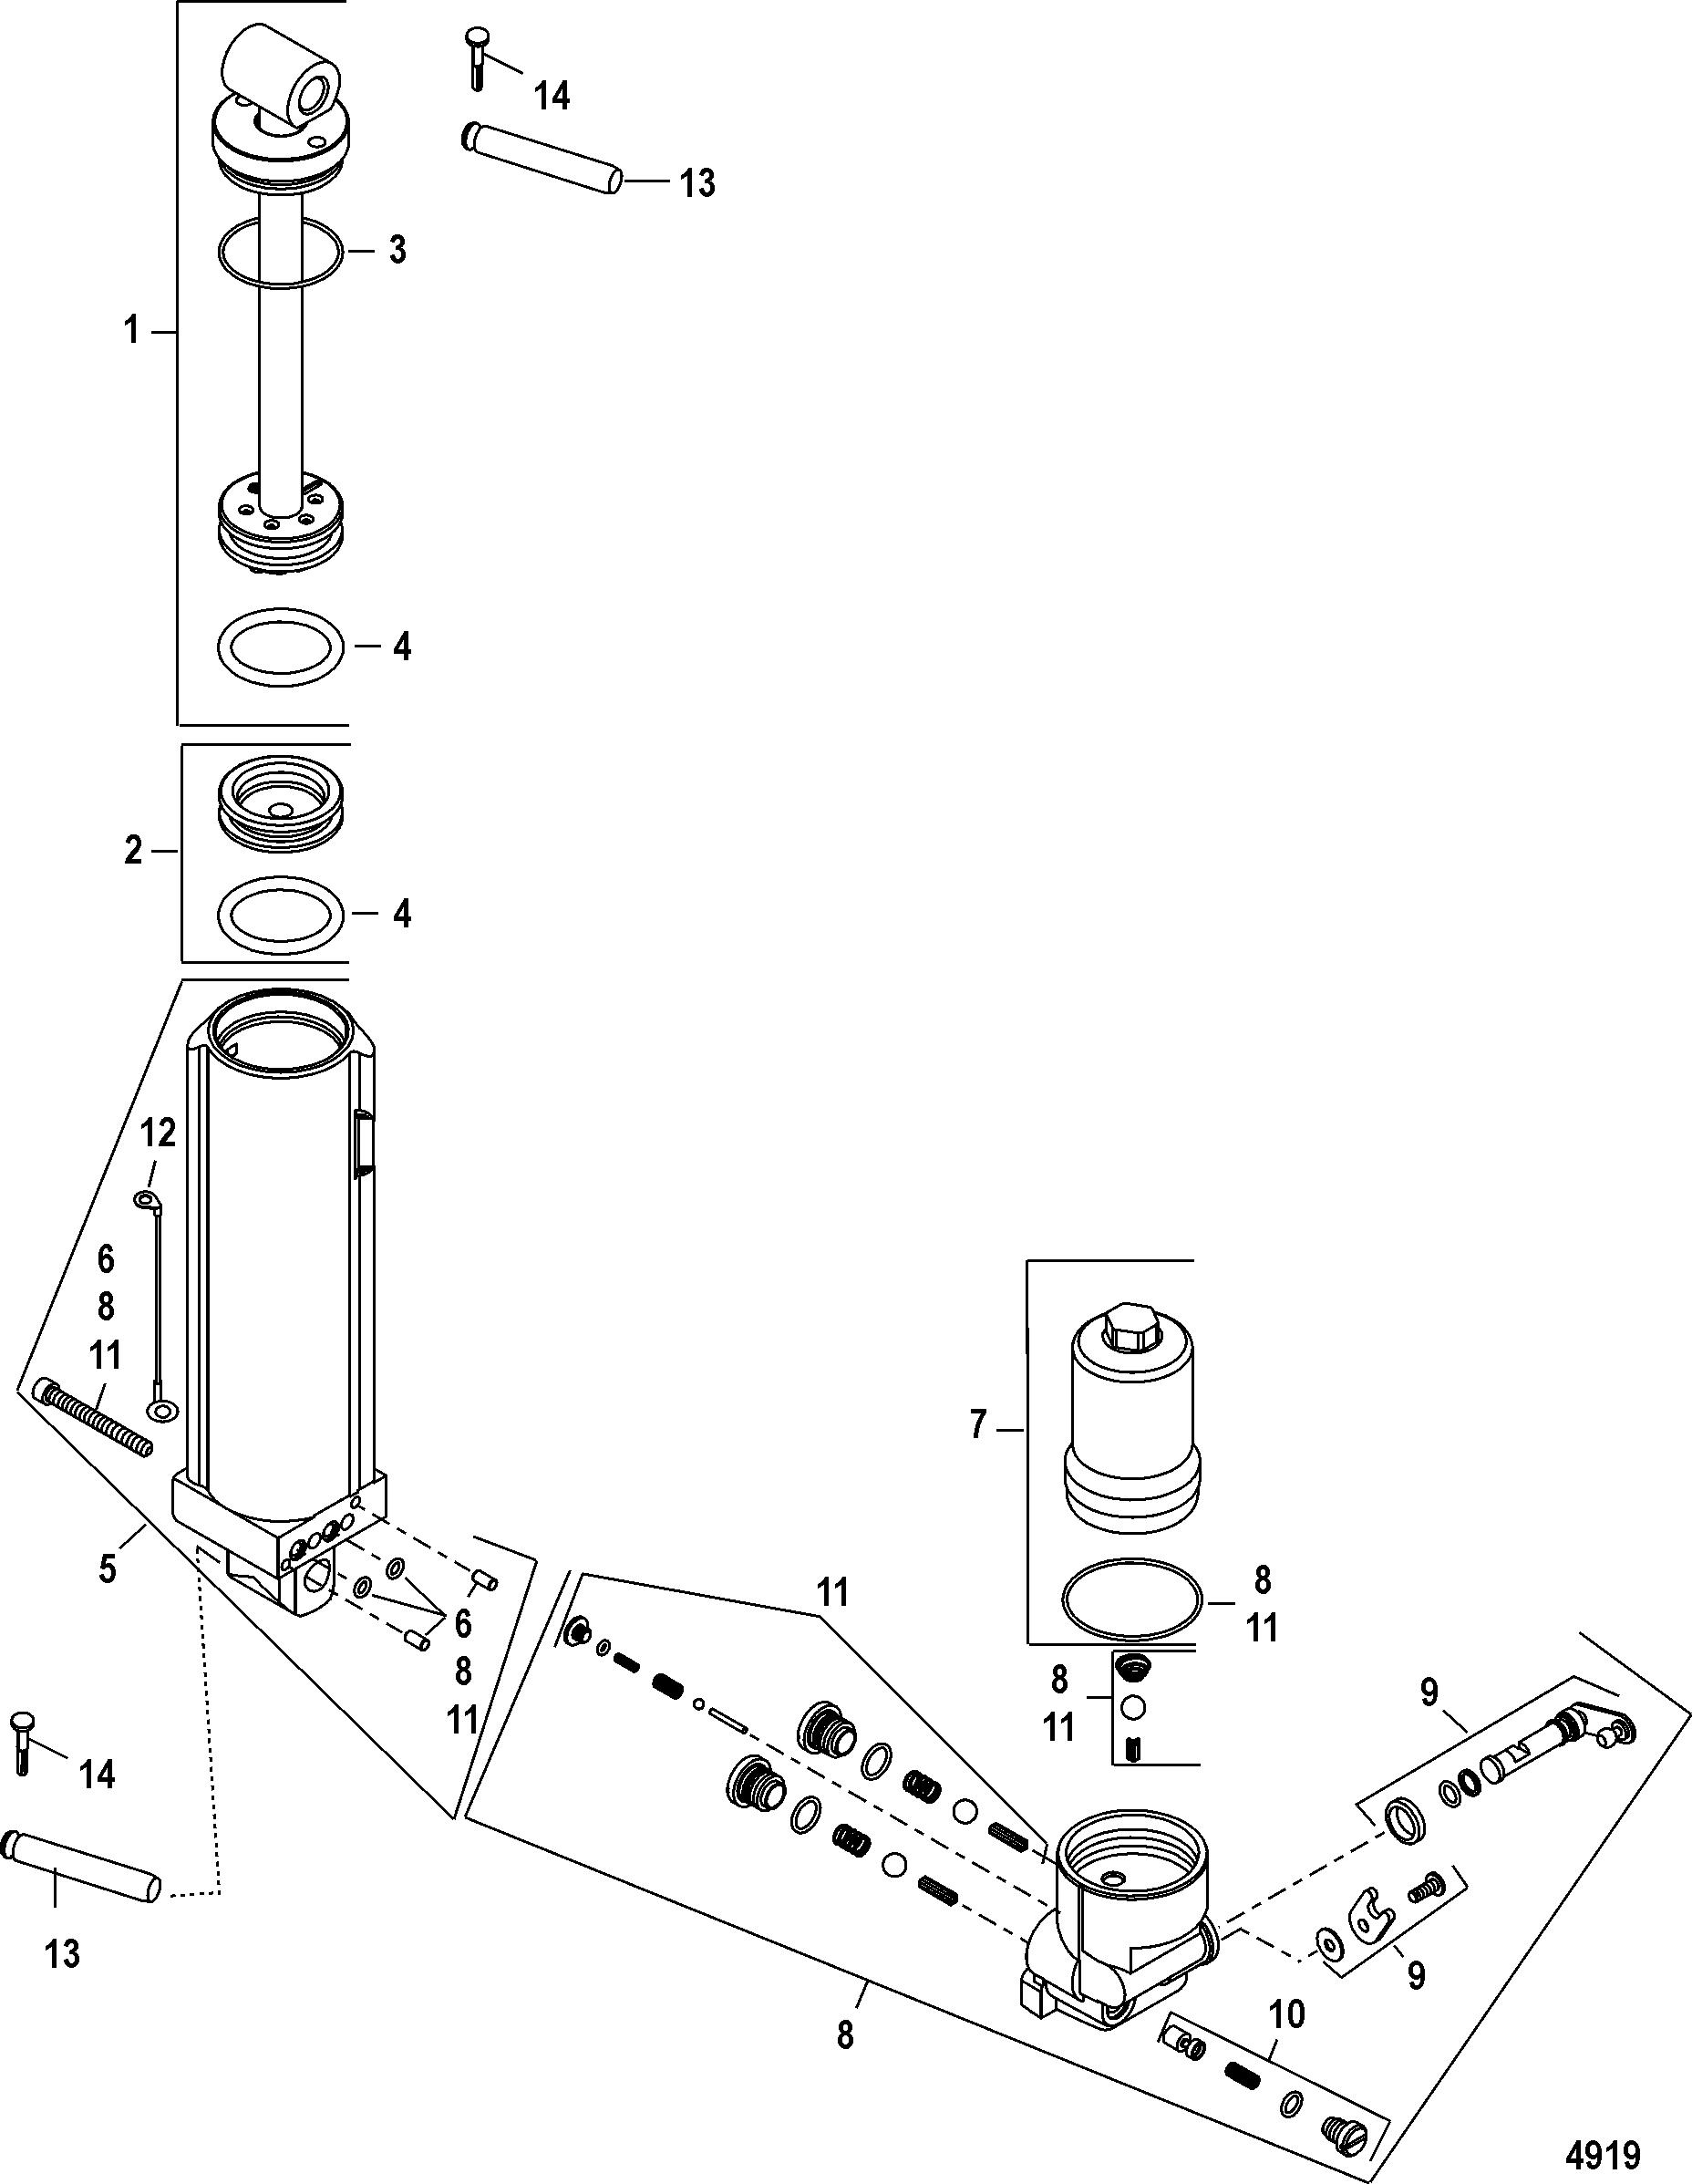 Manual Tilt Components For Mariner Mercury 40 50 60 Jet